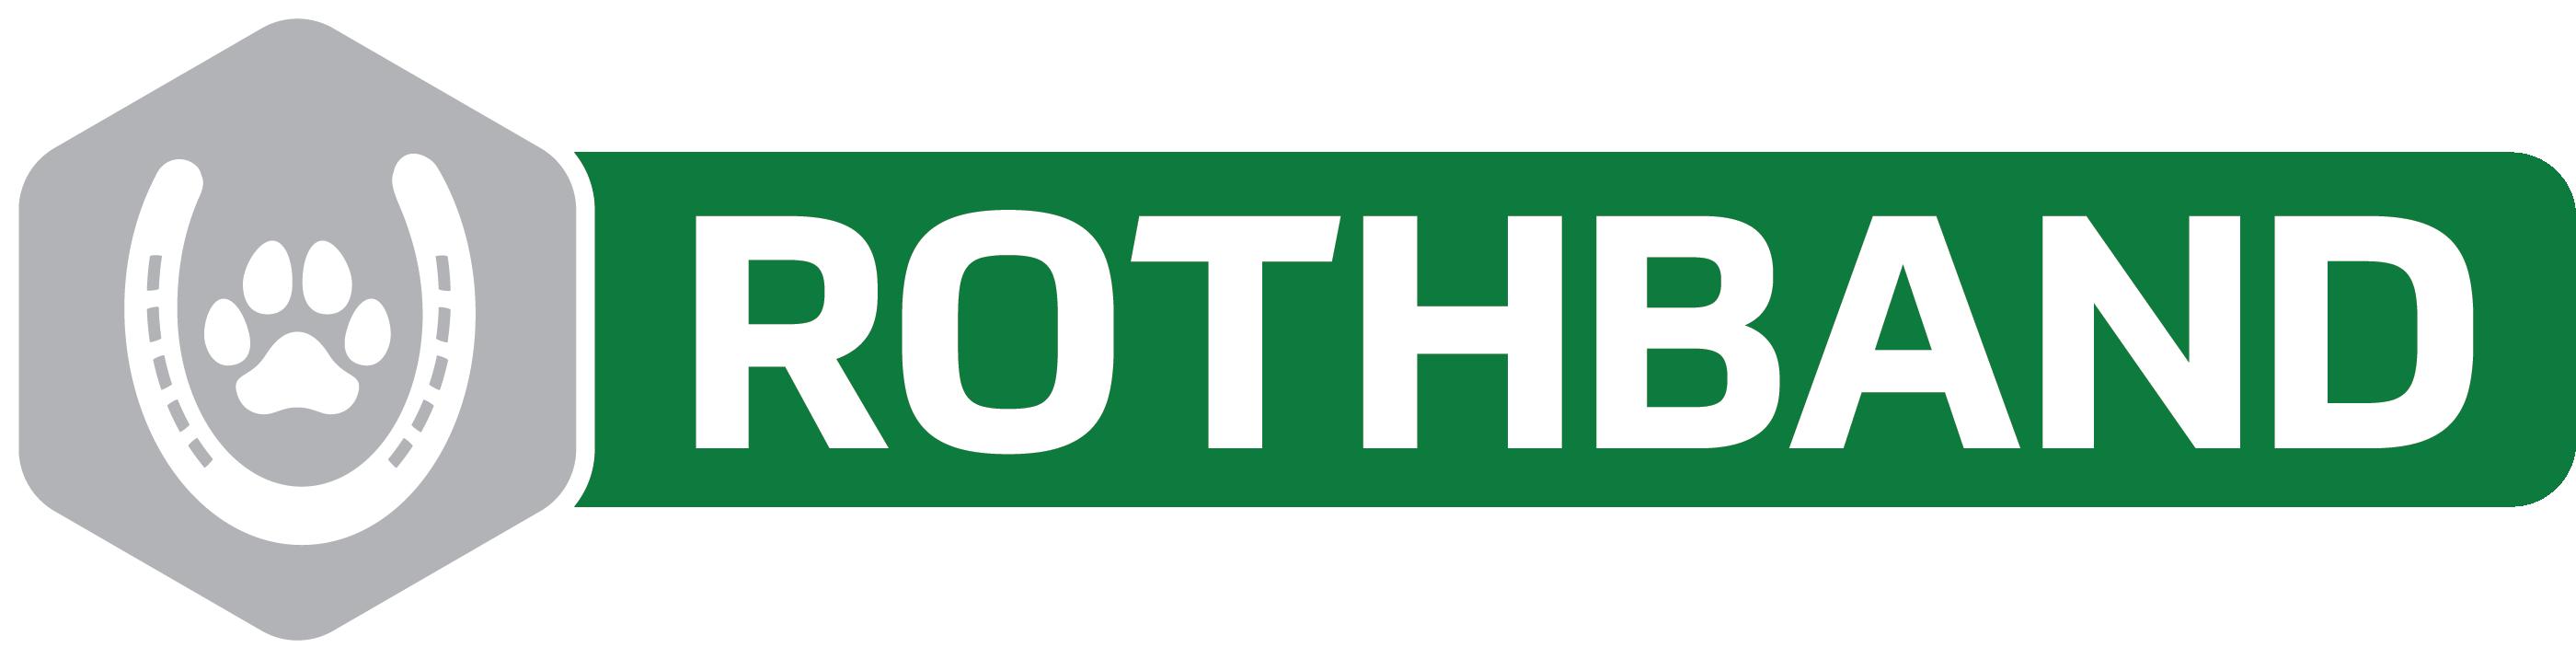 Rothband